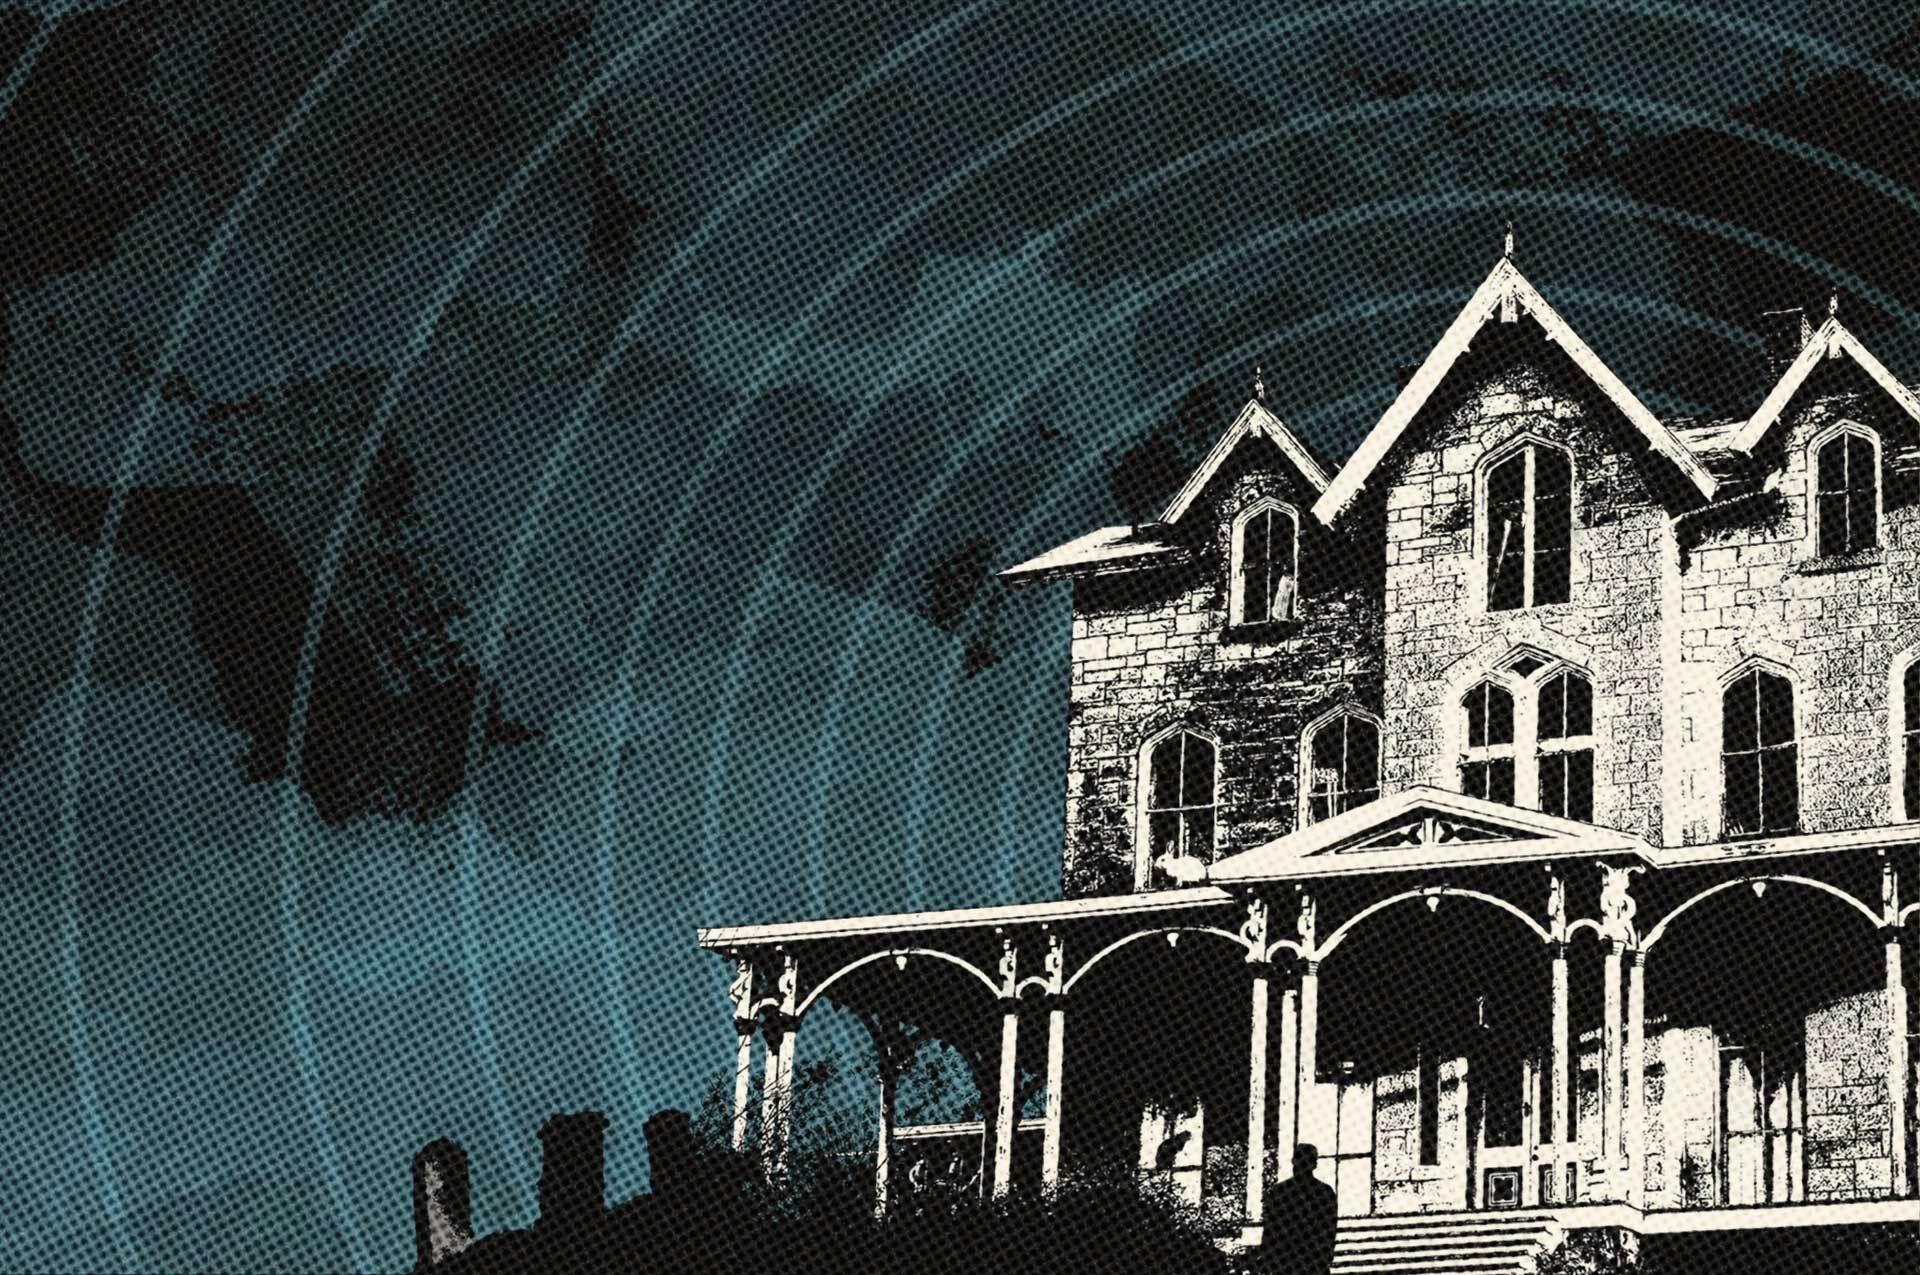 U.S. Genre Film Festivals Announce Collective Virtual Event, NIGHTSTREAM, Set for October Dates